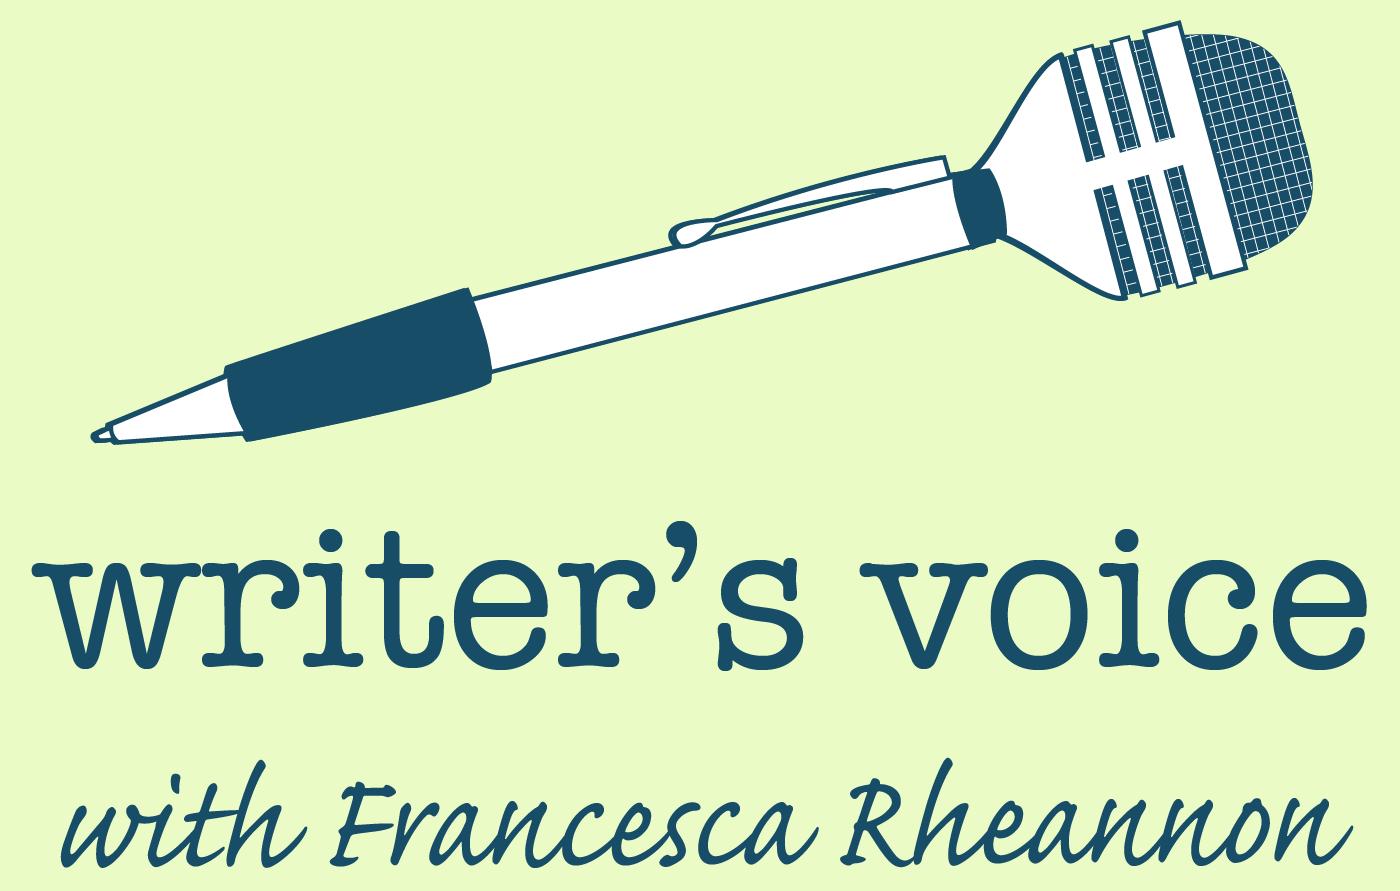 writersvoice-logo-square-1400x1400.png